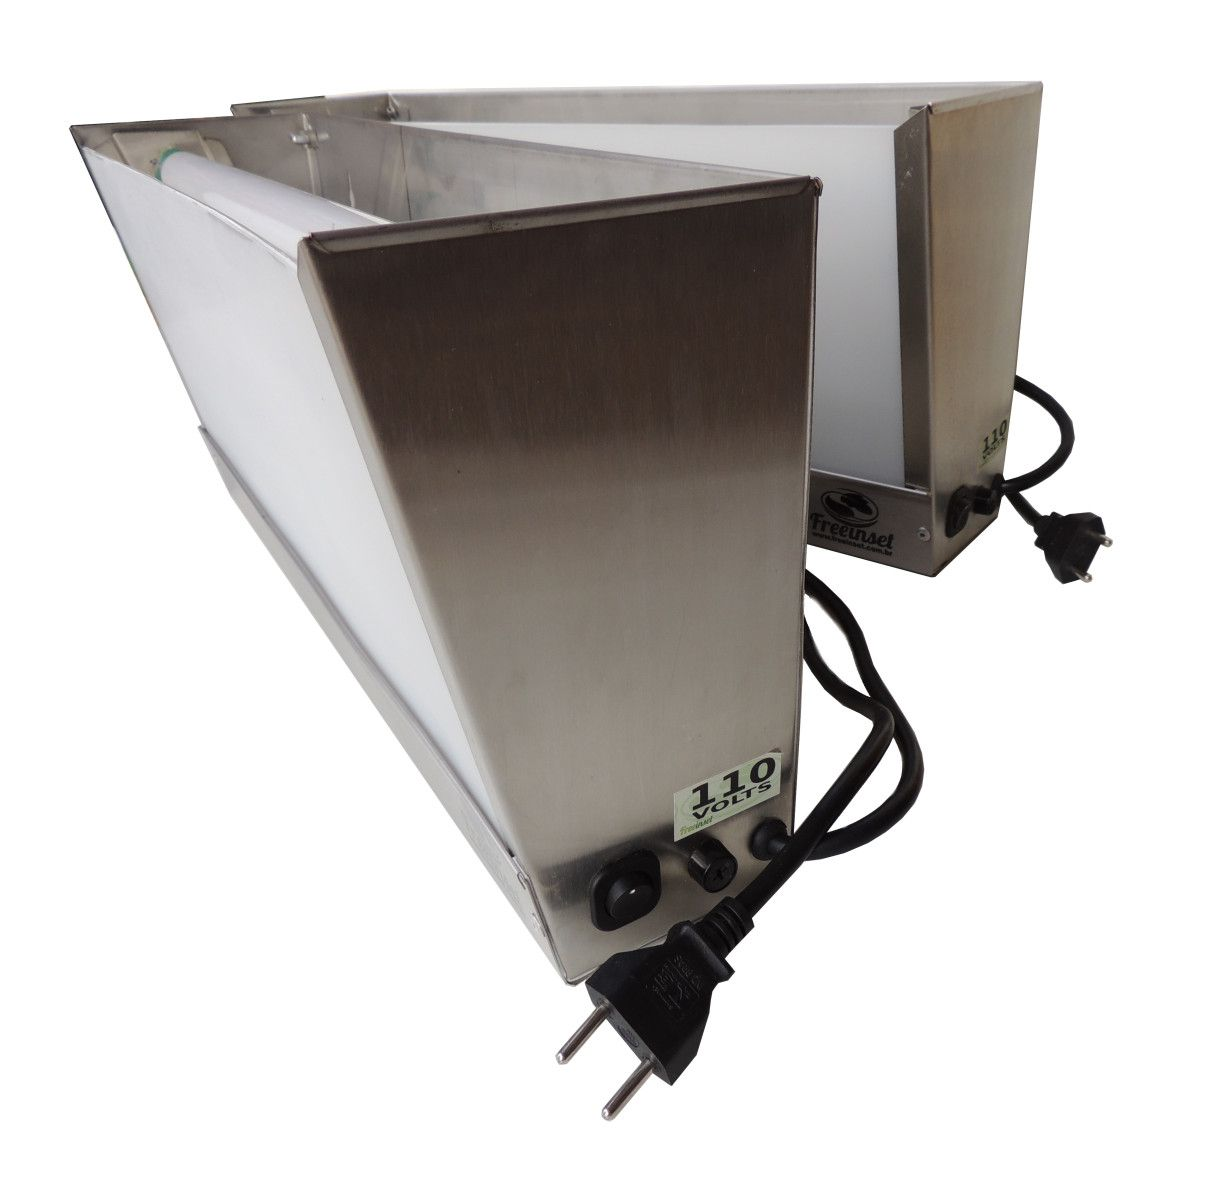 Box 1 Armadilha Luminosa Matar Mosca mosquito Inox 30w 50m2